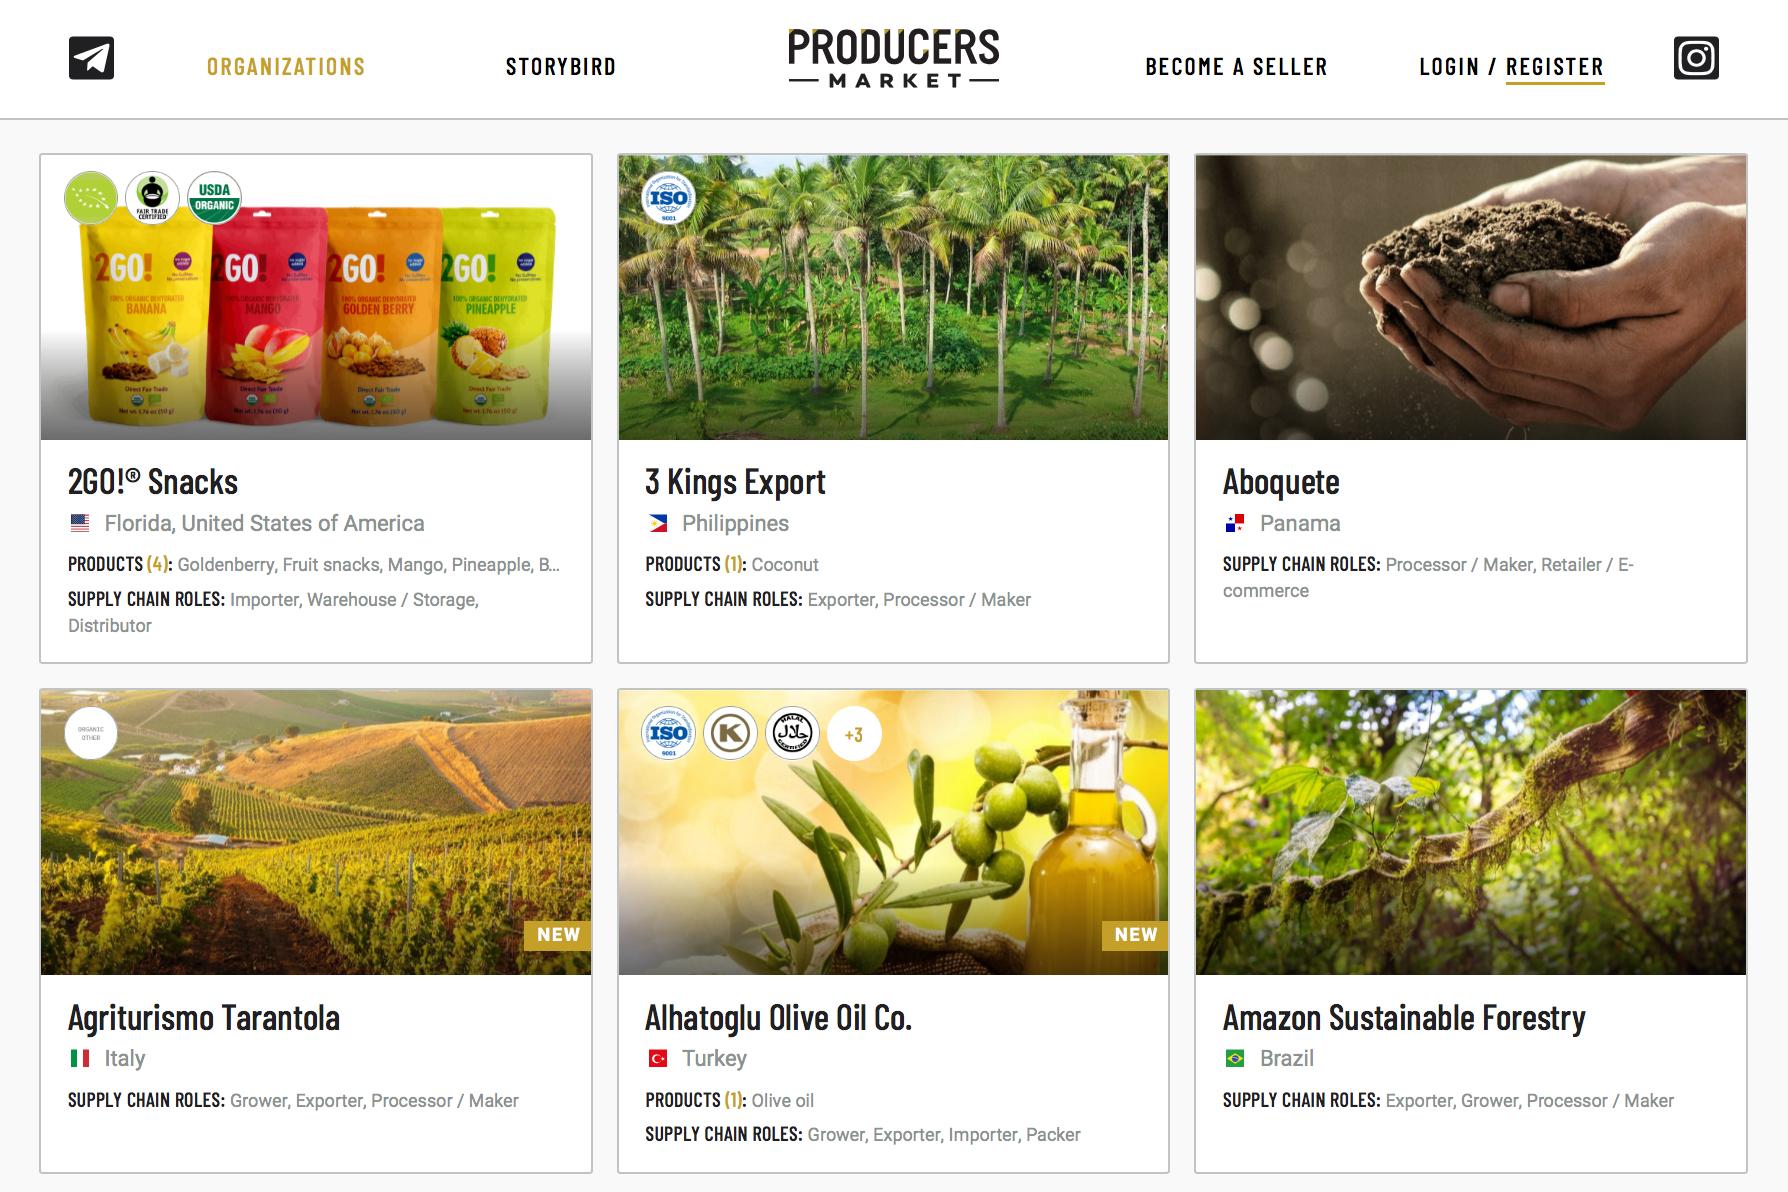 Producers Market Organizations